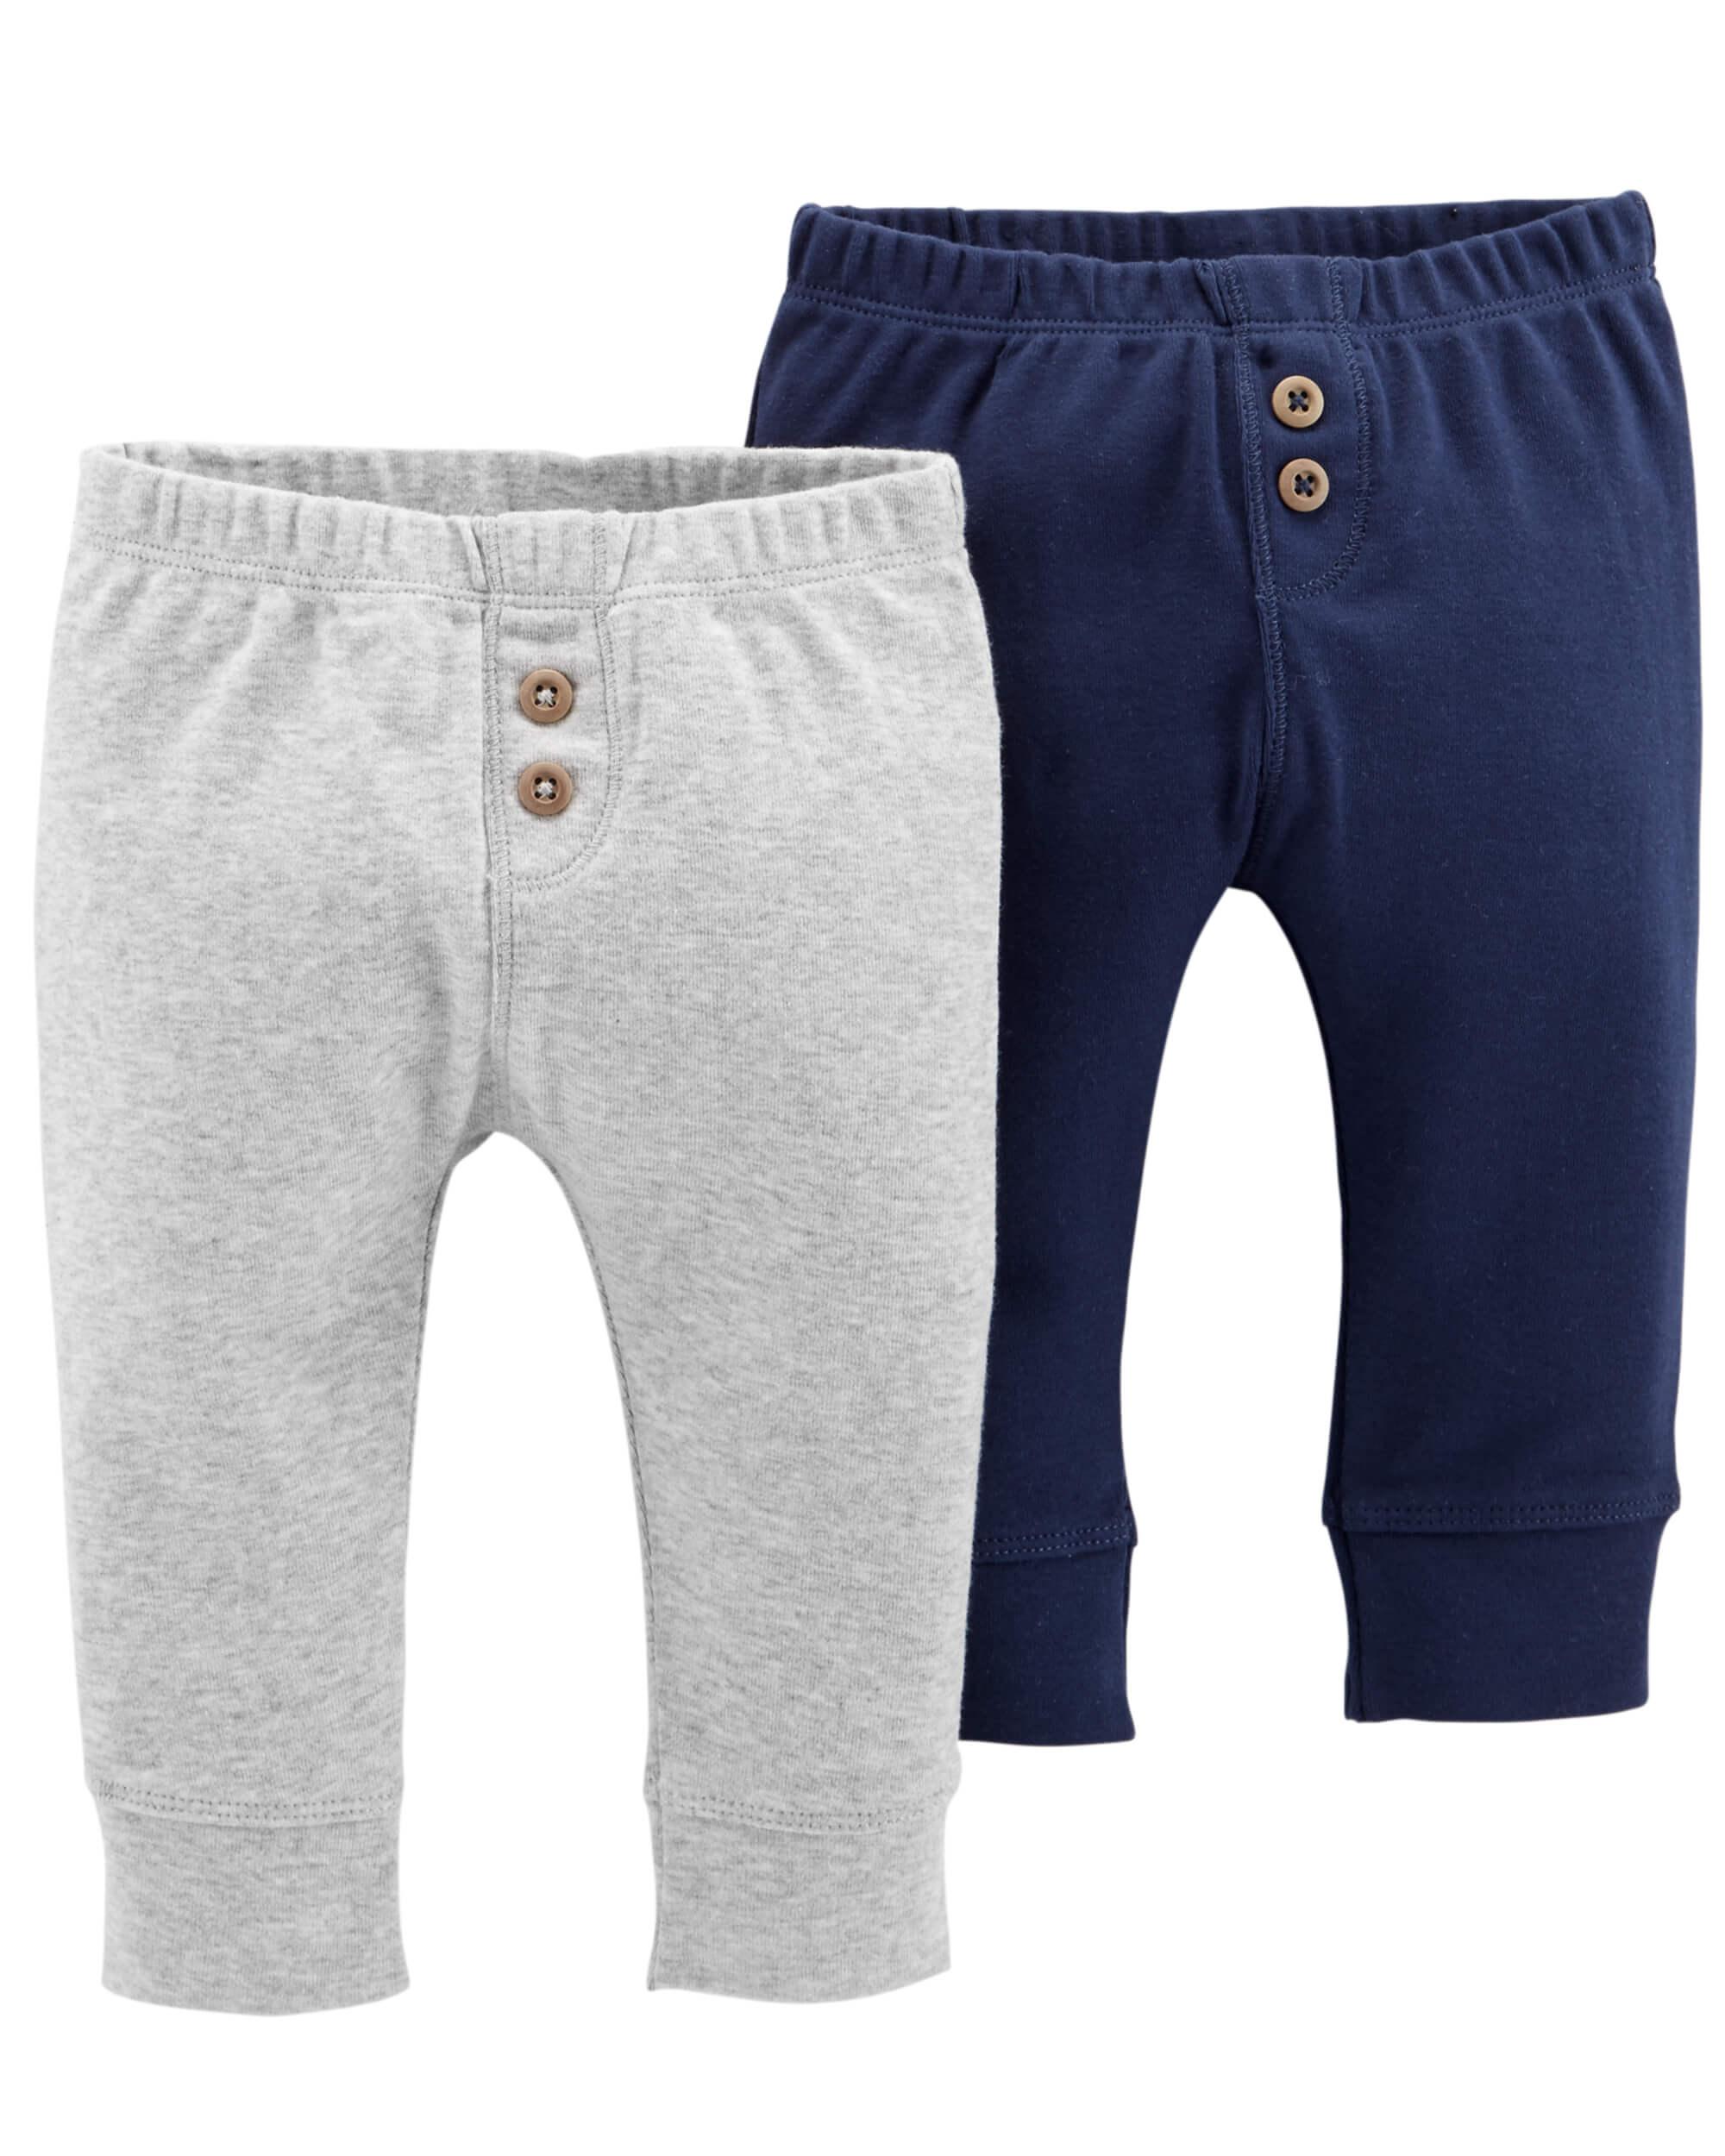 40f20732a0f Carter's Παντελόνι σετ των δύο τεμαχίων μπλέ και γκρί.